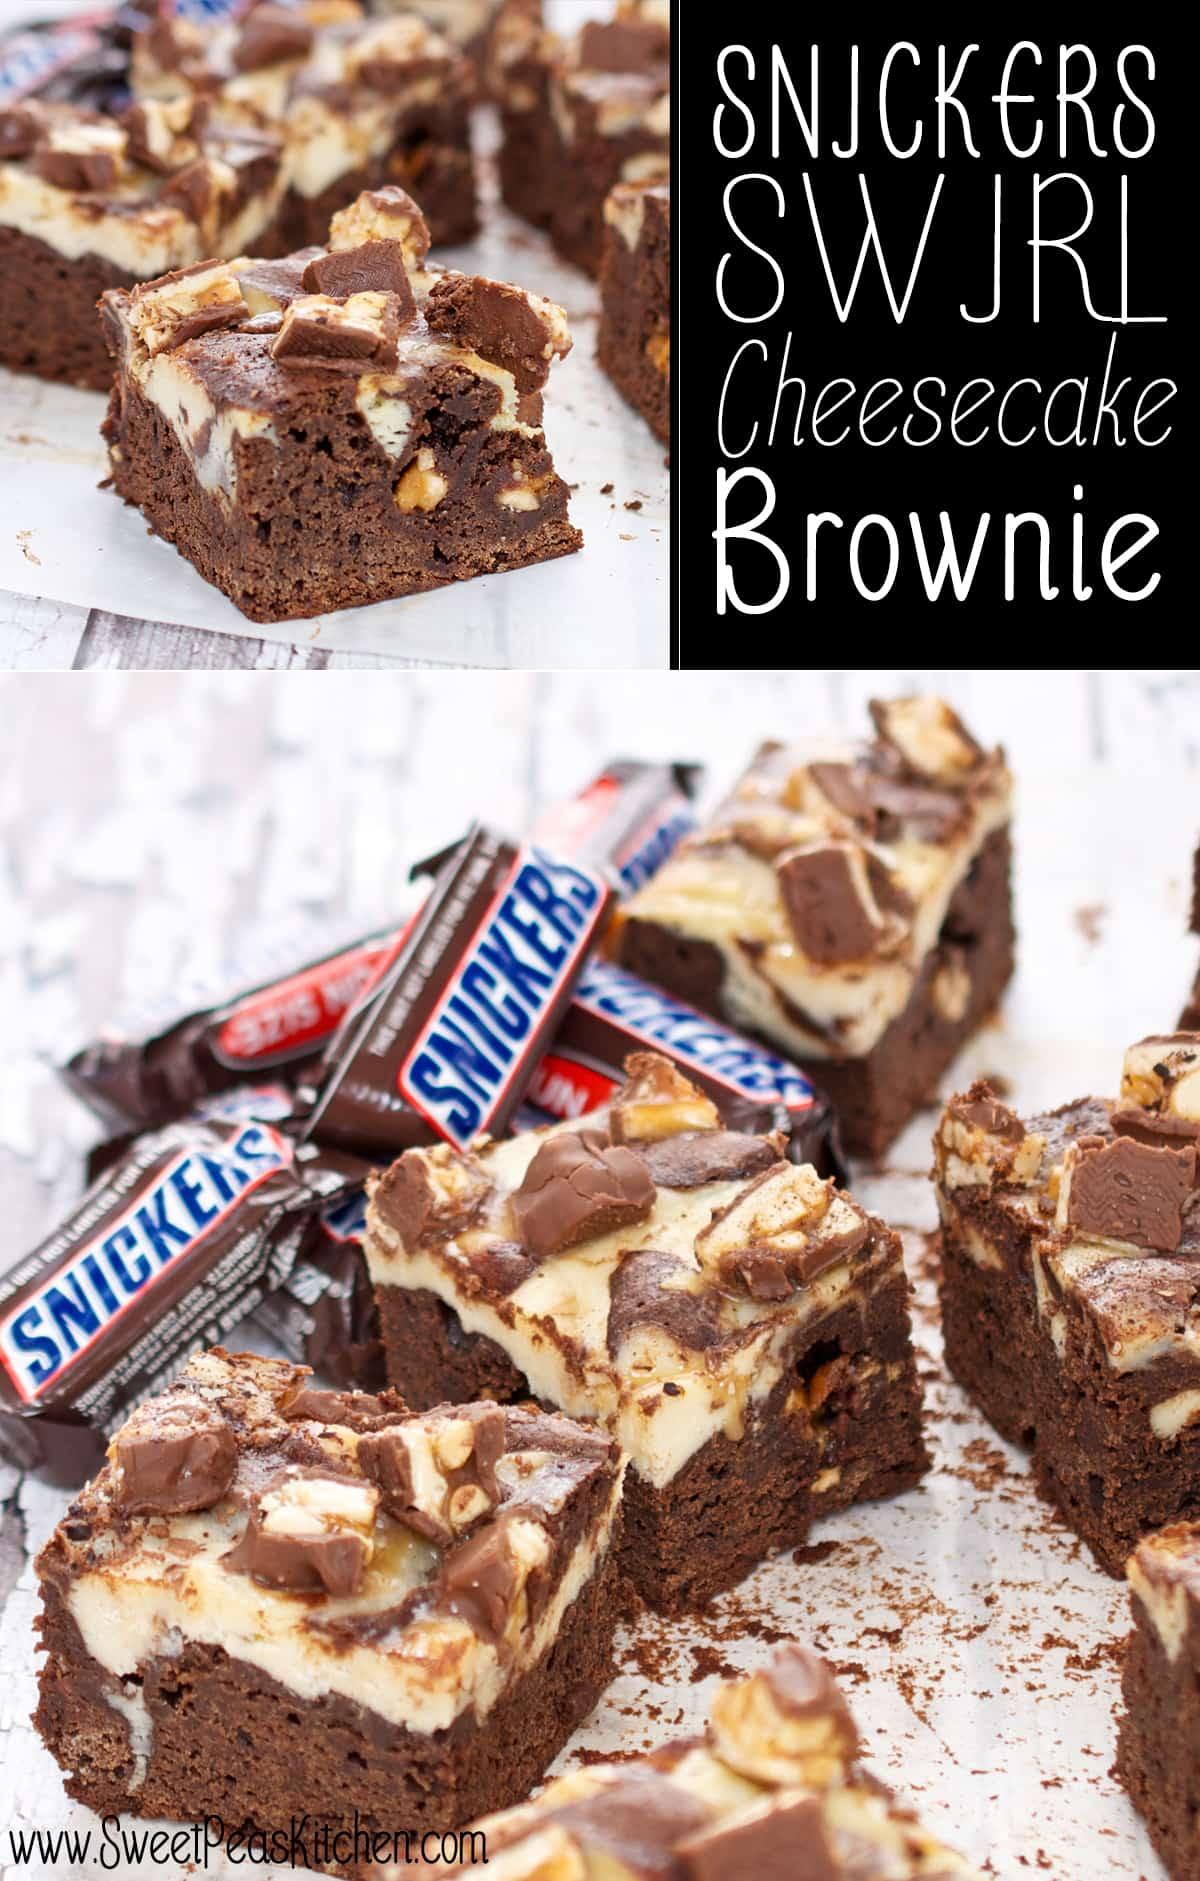 Snickers Swirl Cheesecake Brownie Recipe